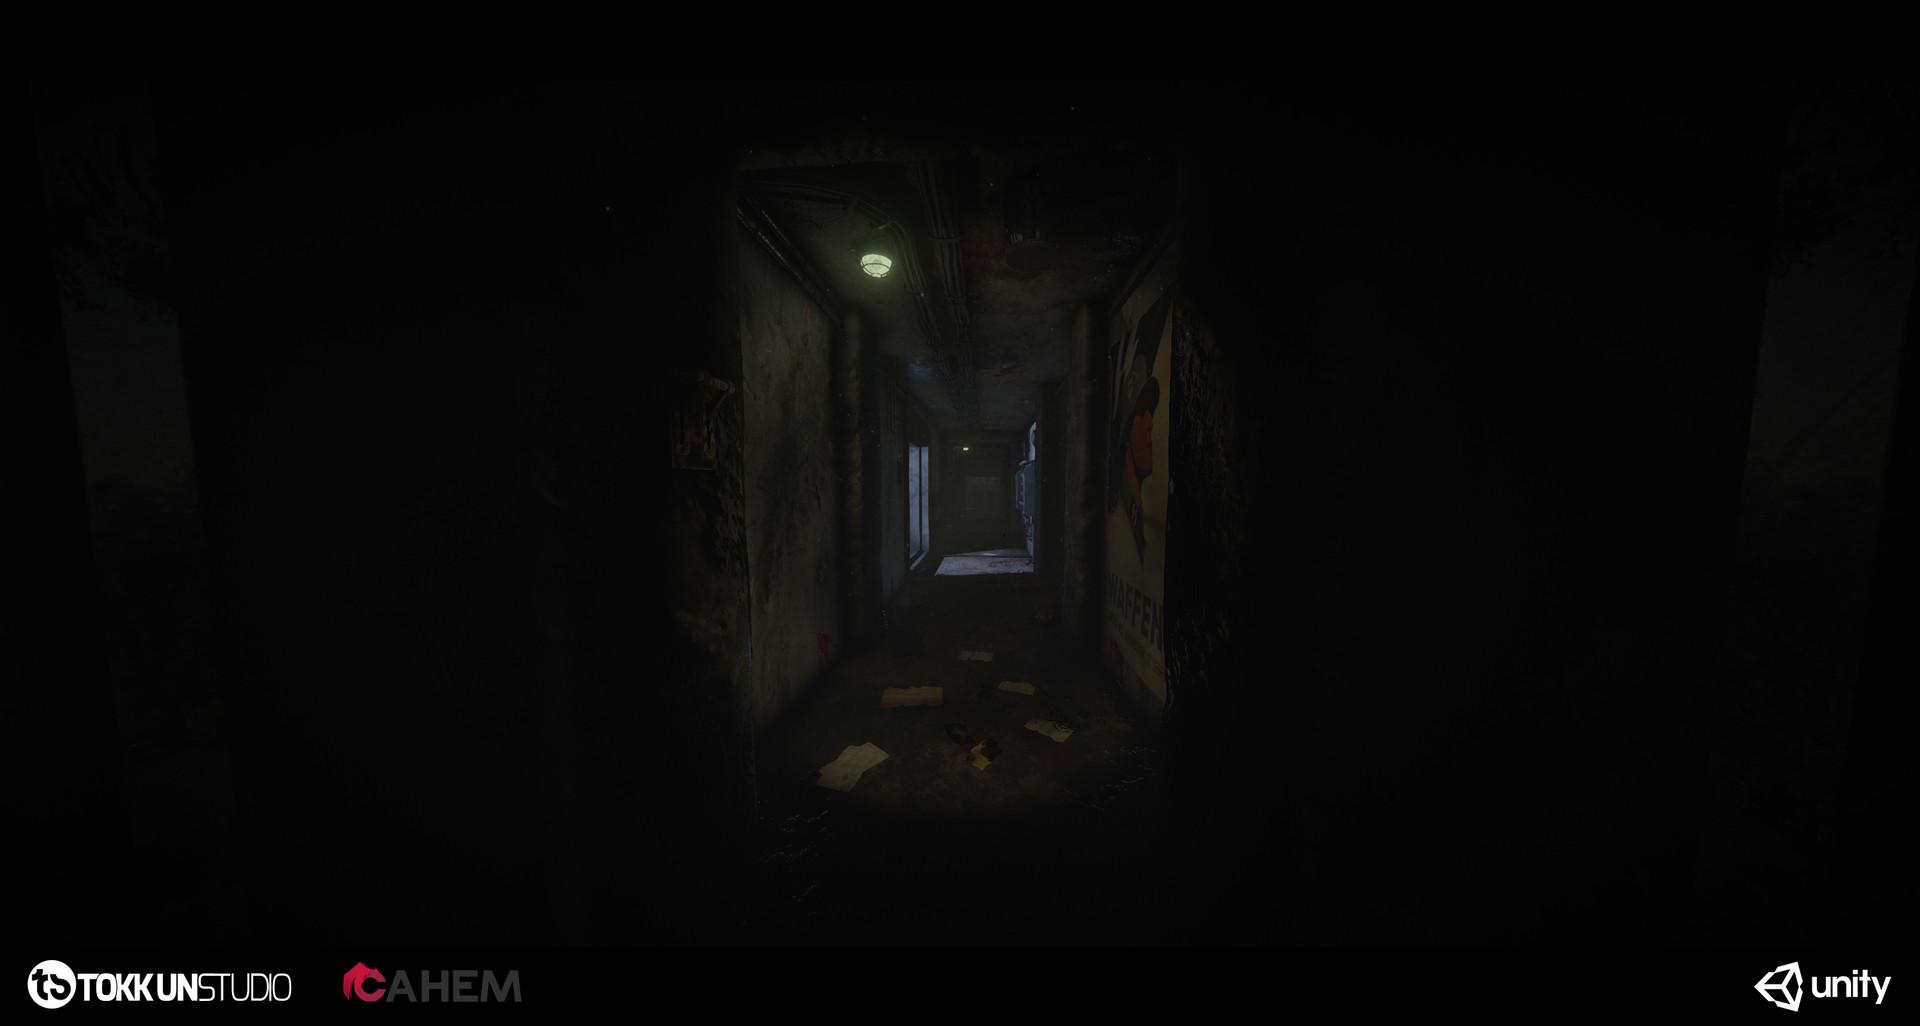 Tokkun studio bunker shot 04